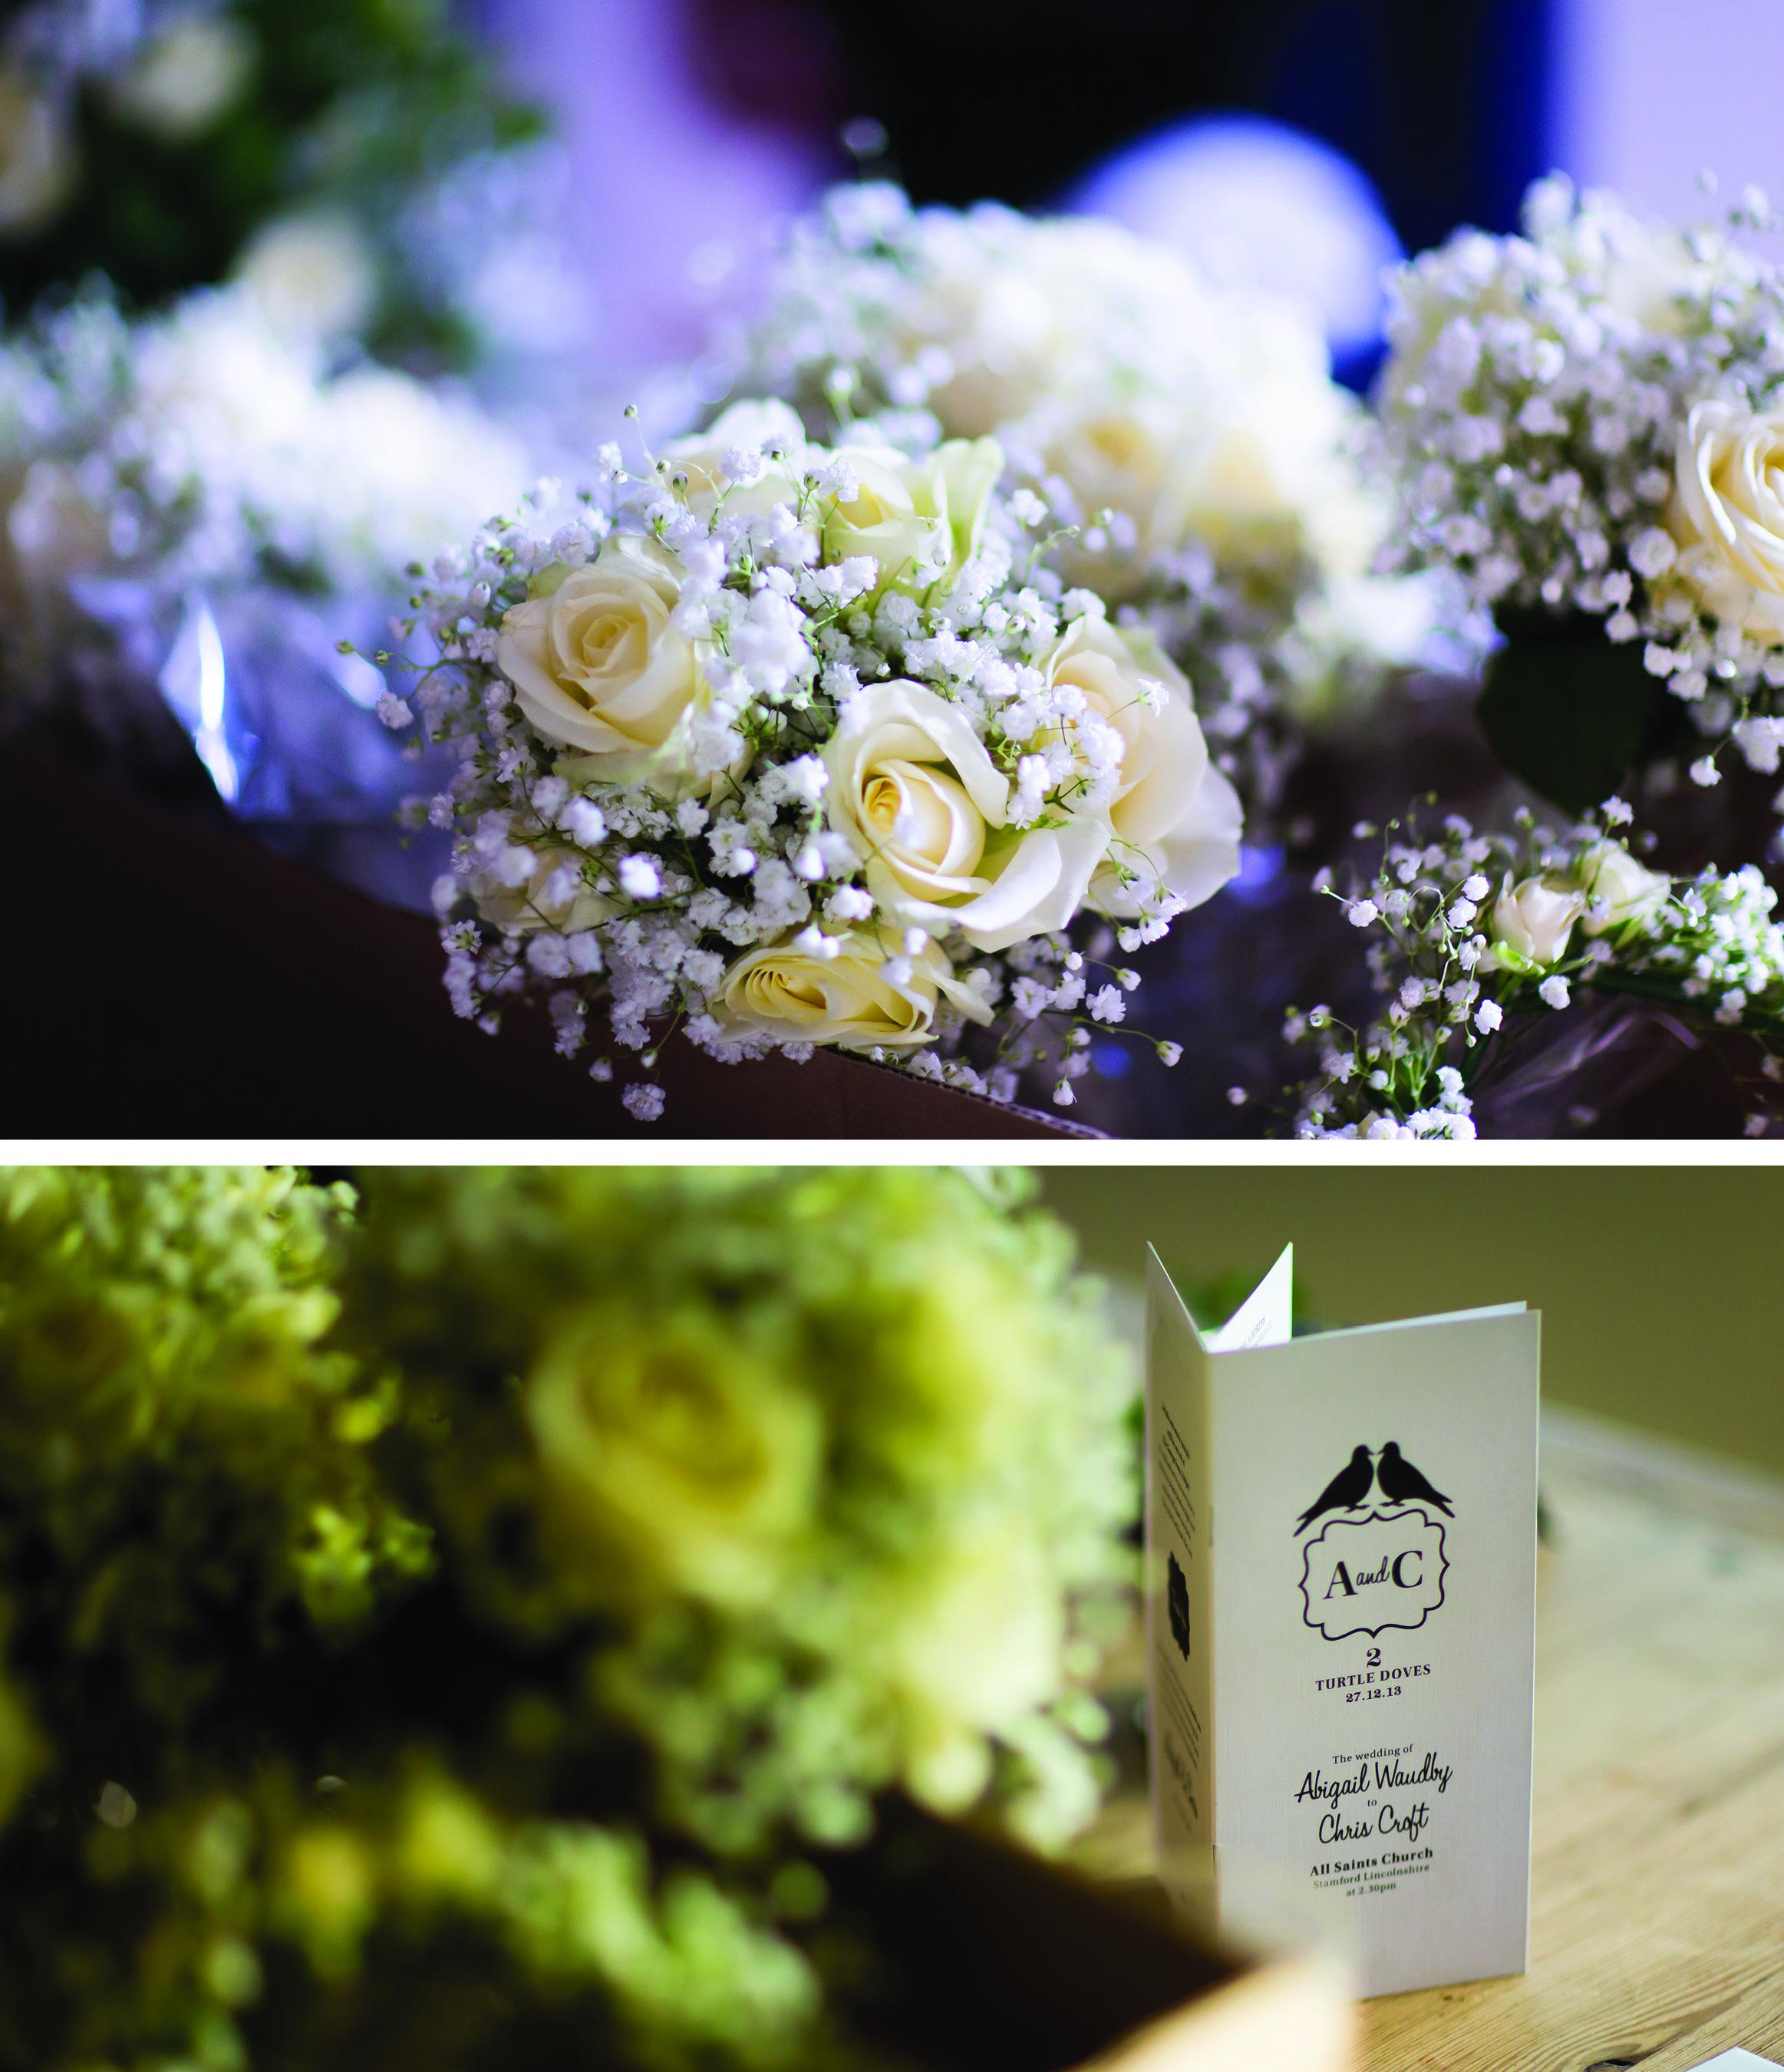 A&C-flowers.jpg